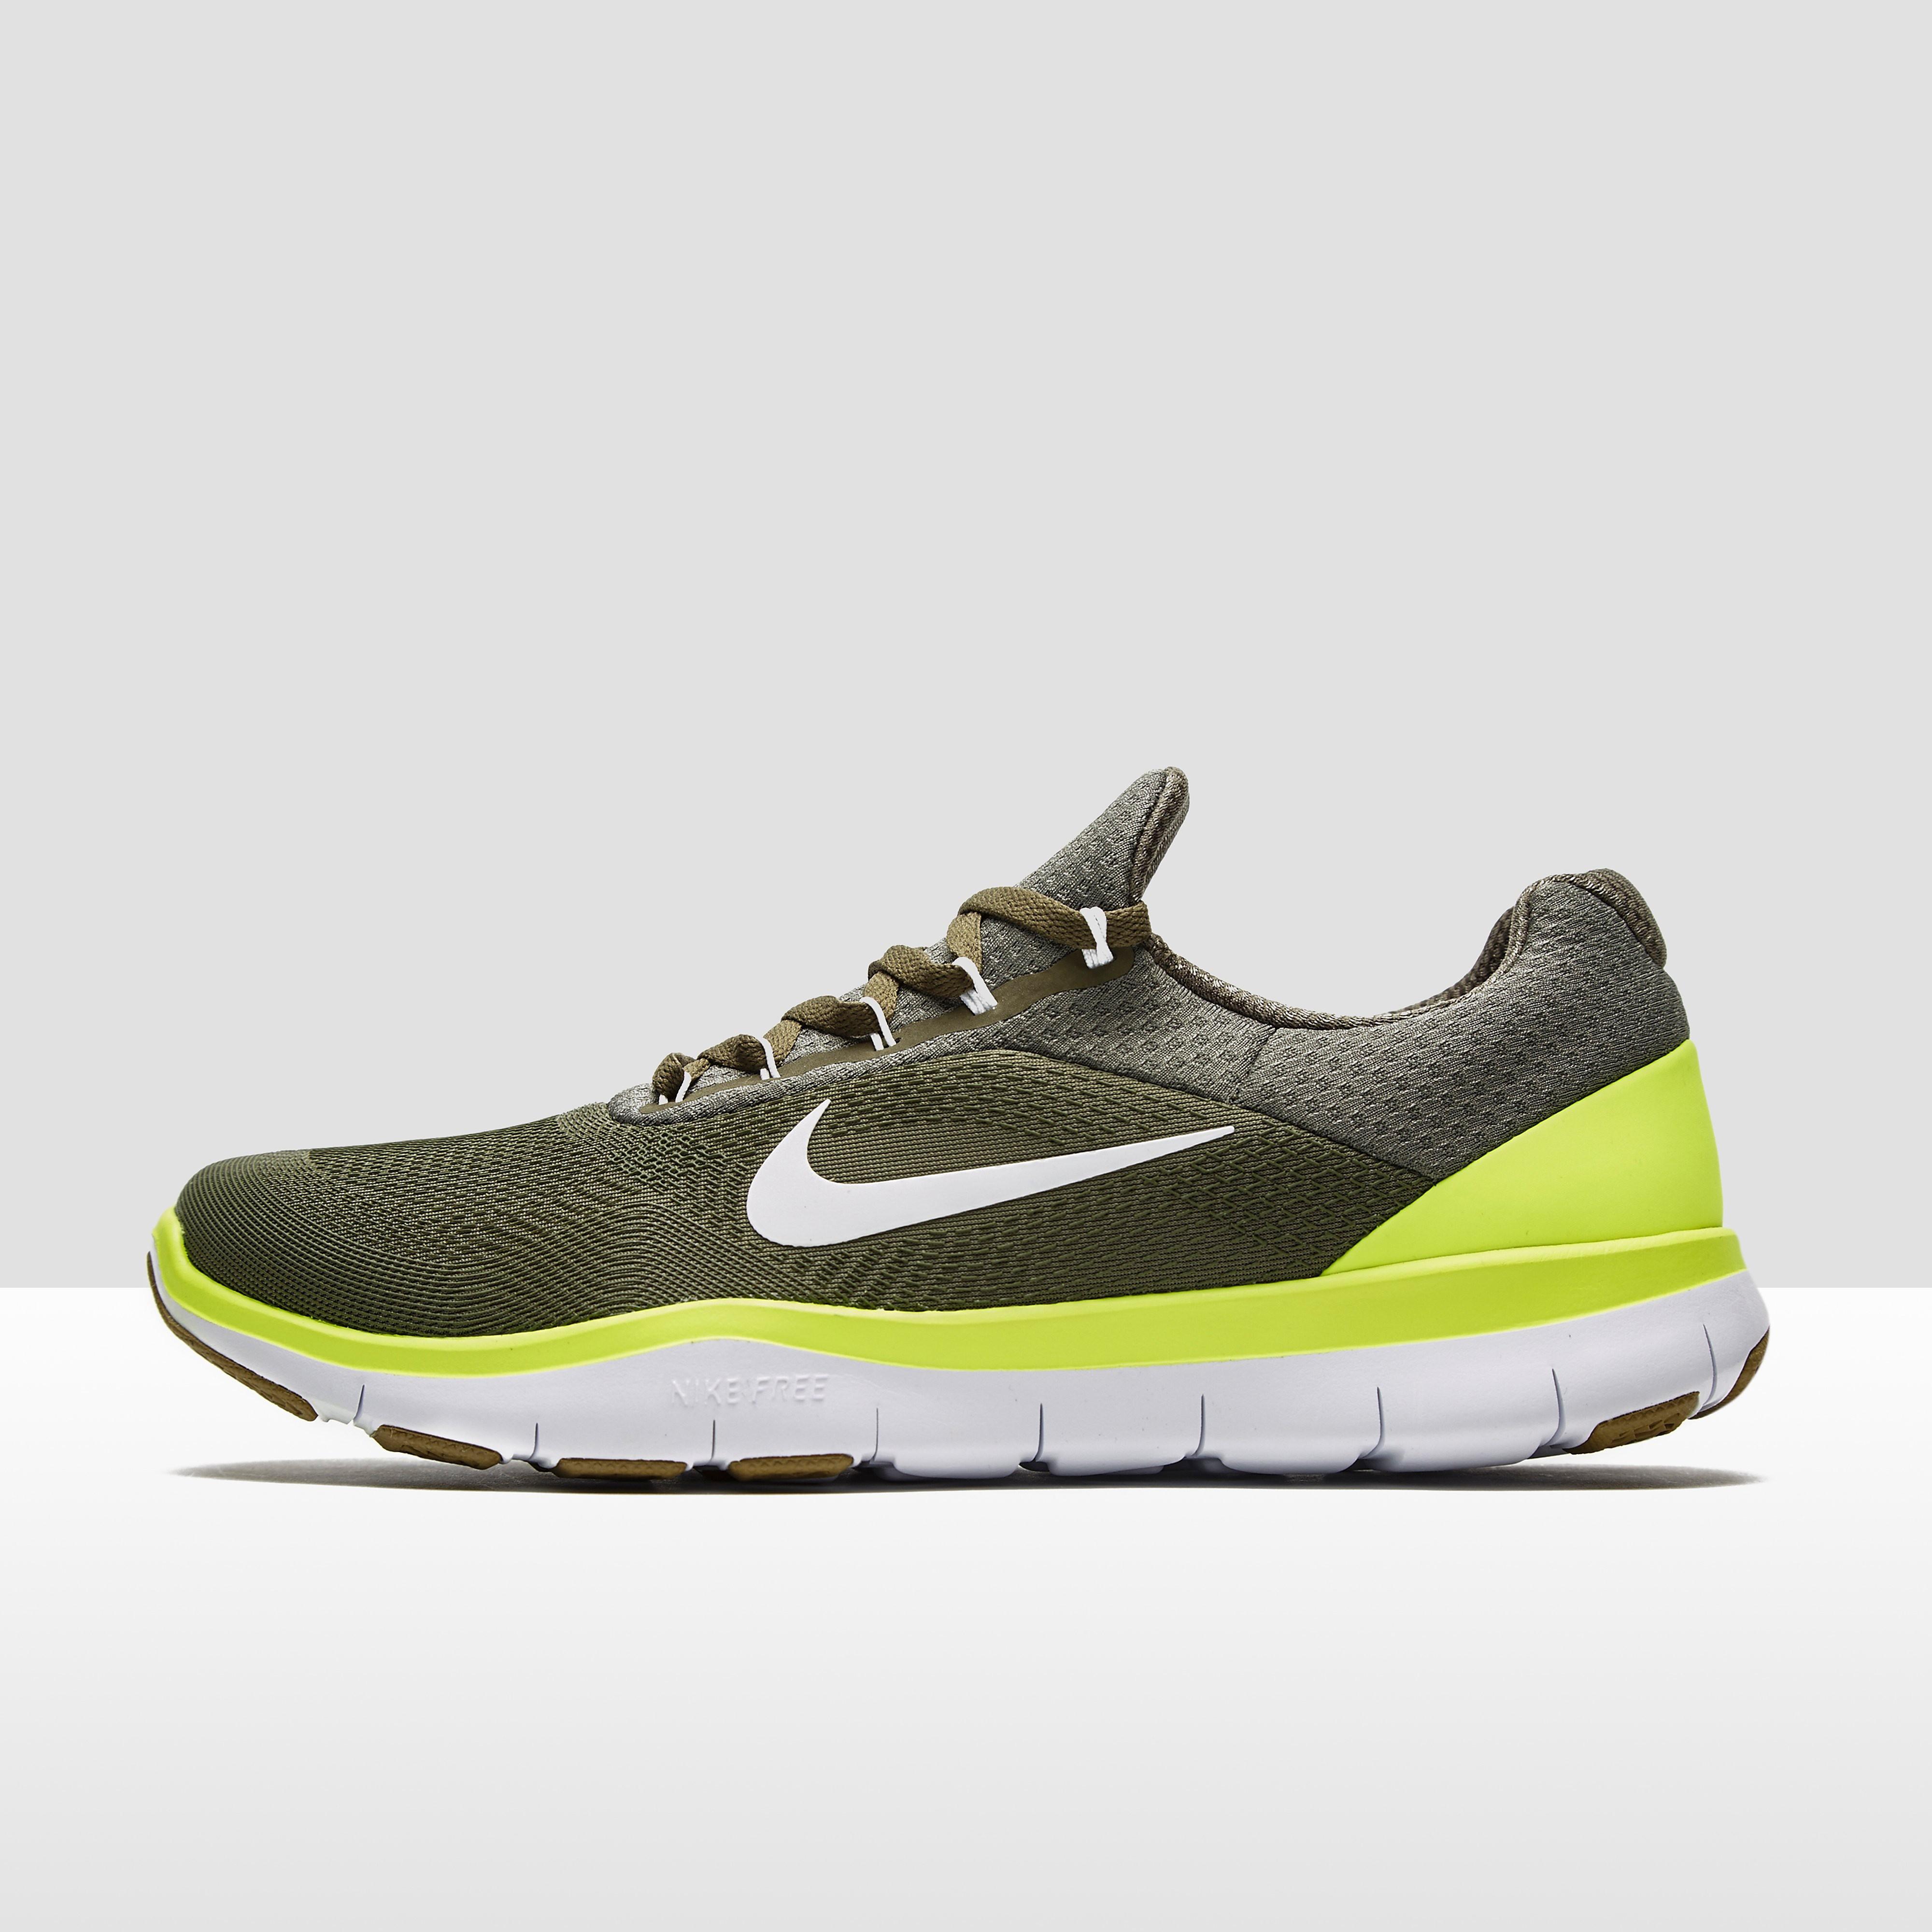 Nike Free V7 Men's Training Shoes